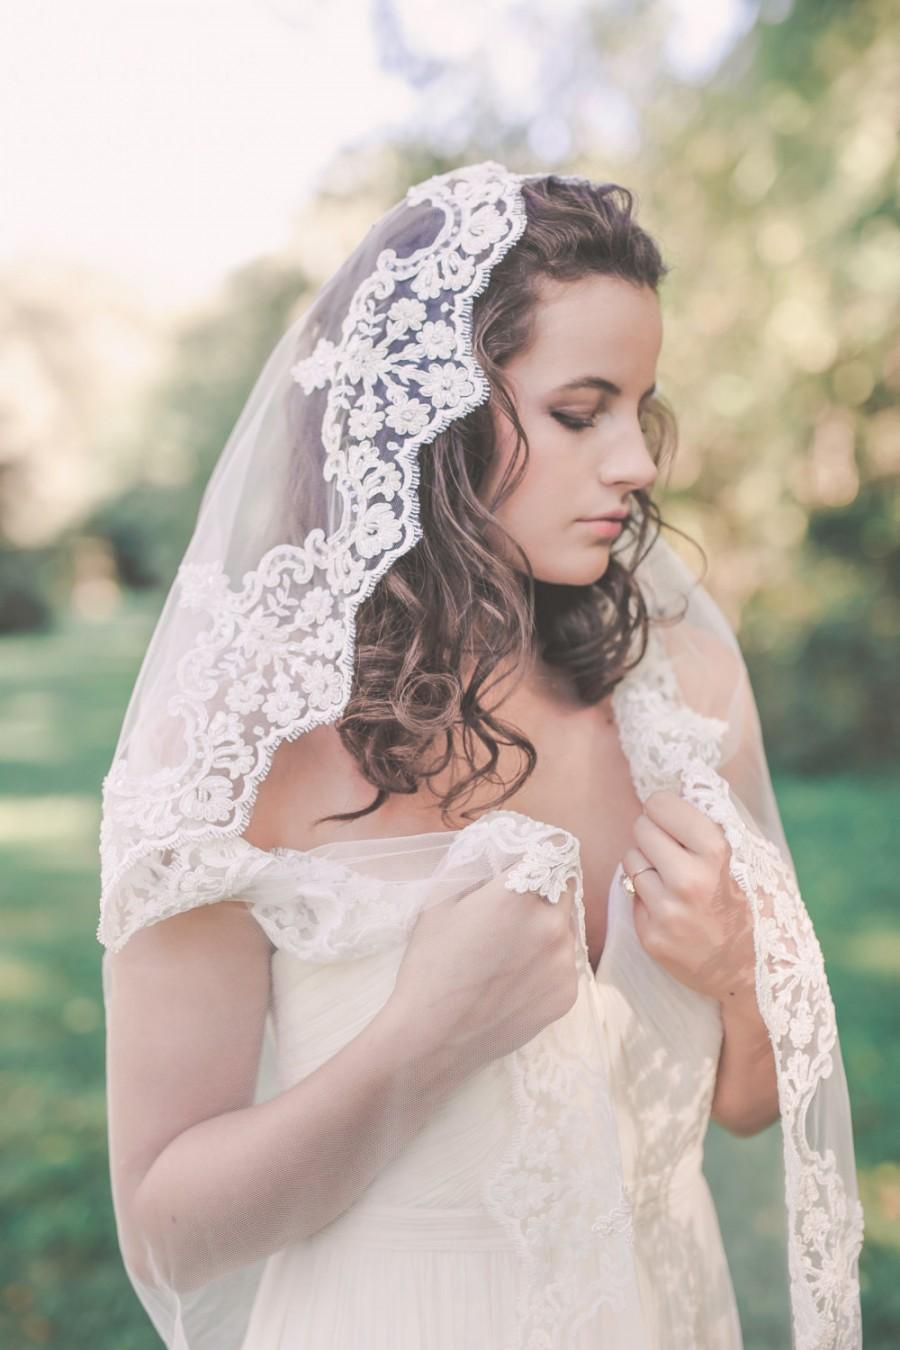 Mariage - mantilla veil, lace mantilla veil, wedding mantilla, beaded veil, chapel mantilla, chapel length veil with lace edge - GLORIA